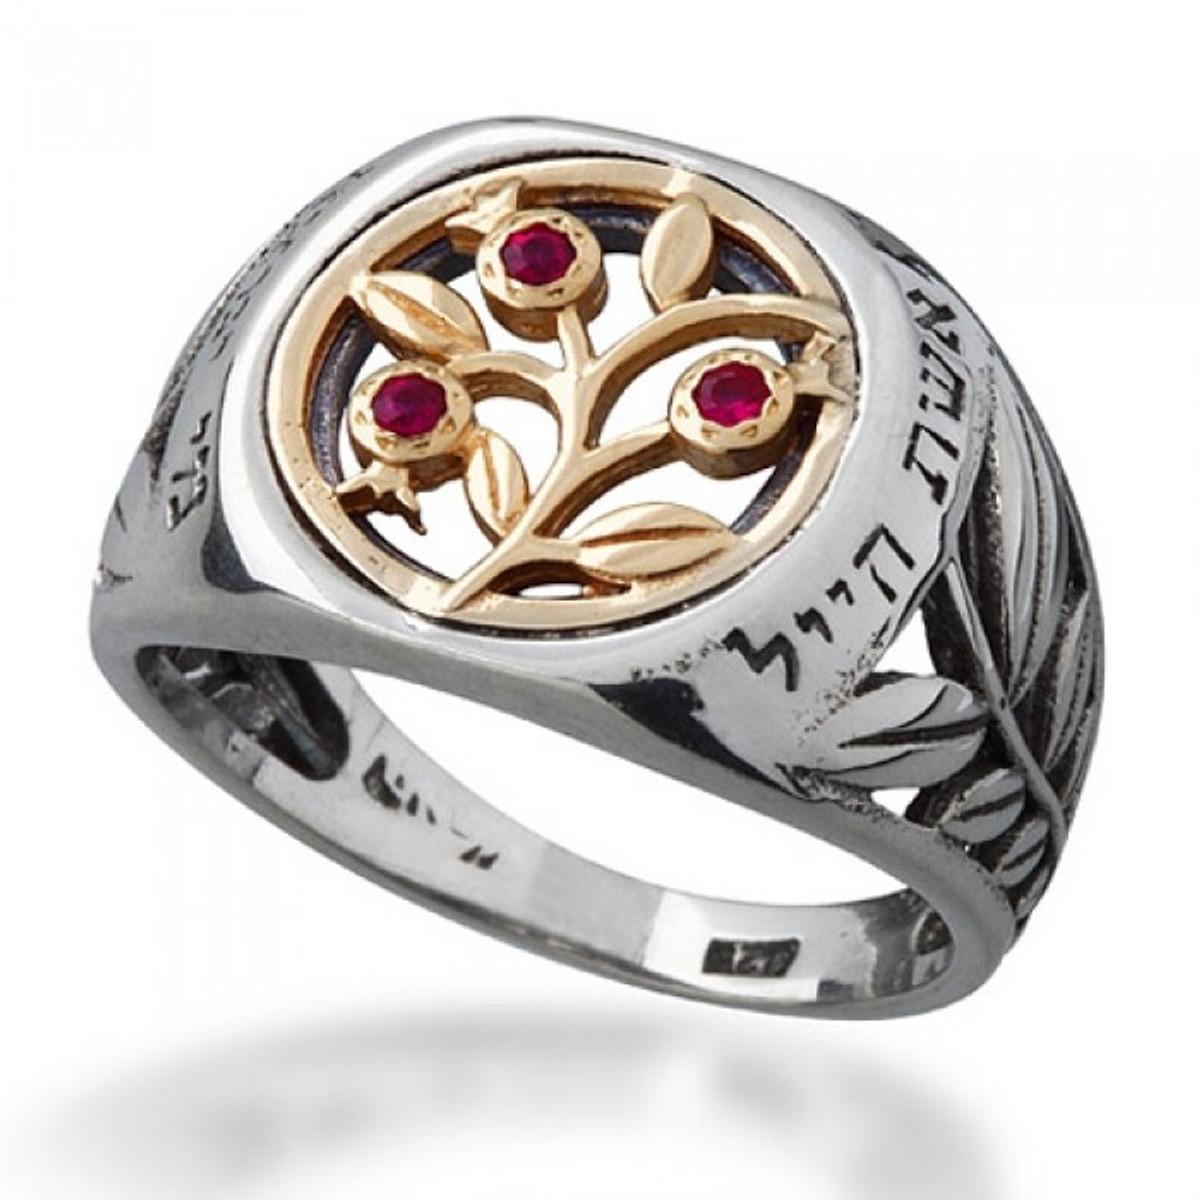 Eshet Chayil Pomegranate Silver & Gold Ring by Haari